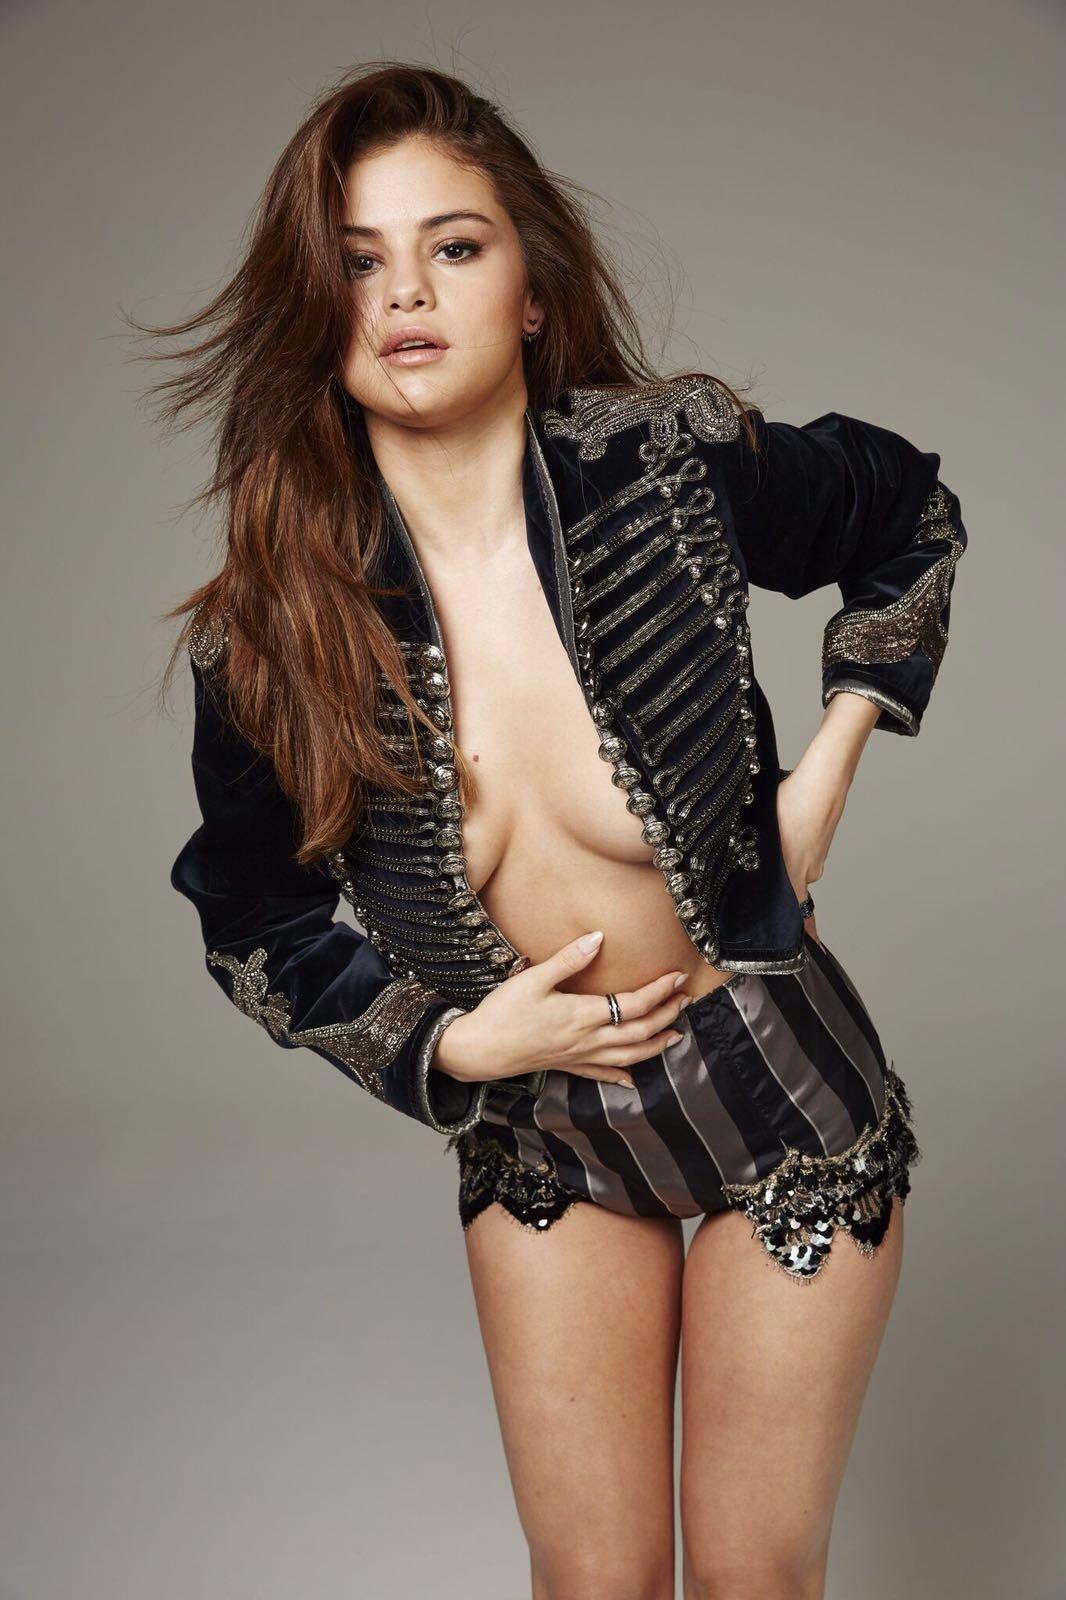 Selena Gomez fappening barechested